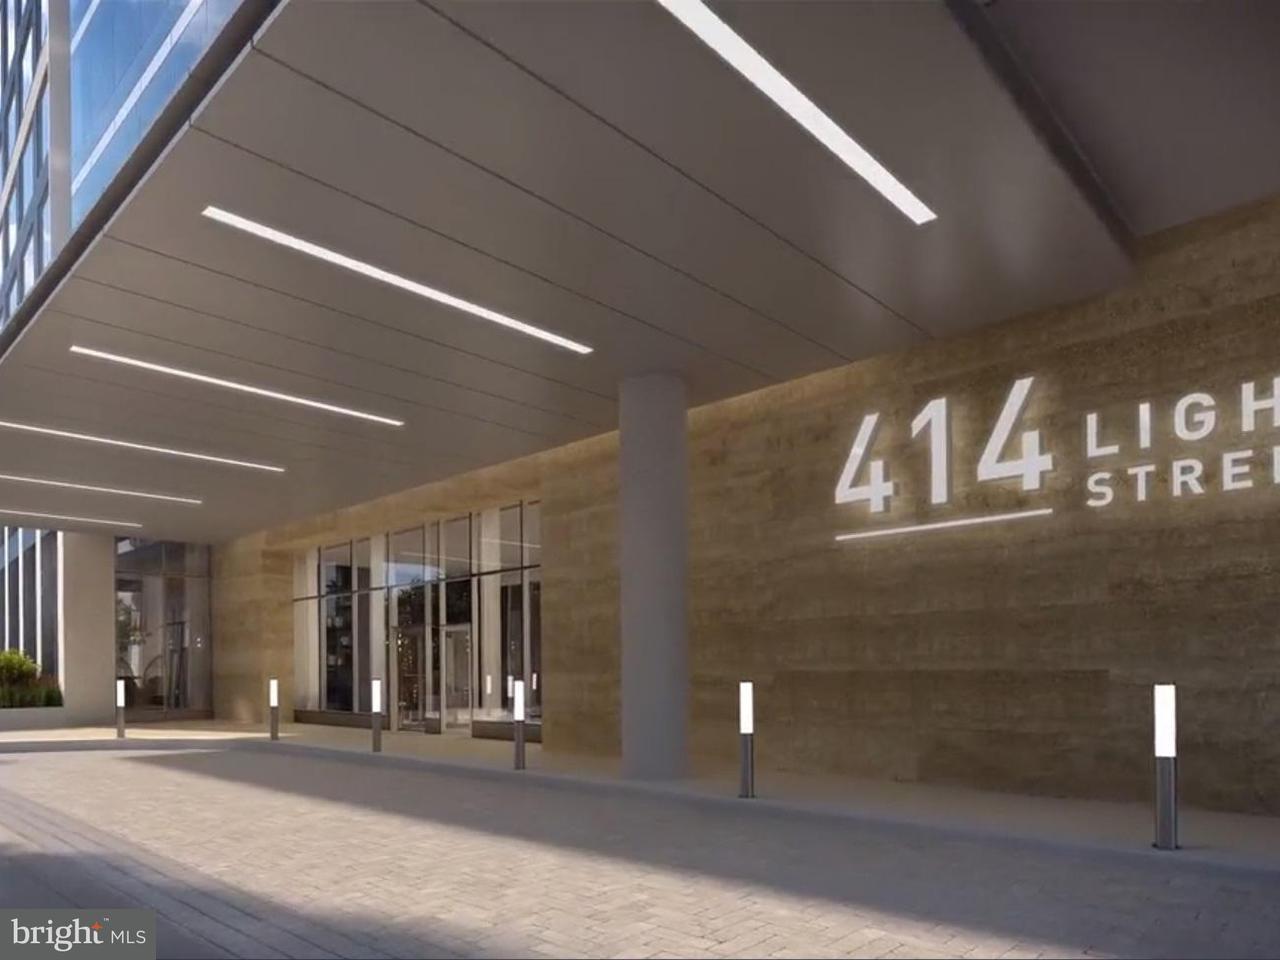 Condominium for Rent at 414 Light St #409 Baltimore, Maryland 21202 United States